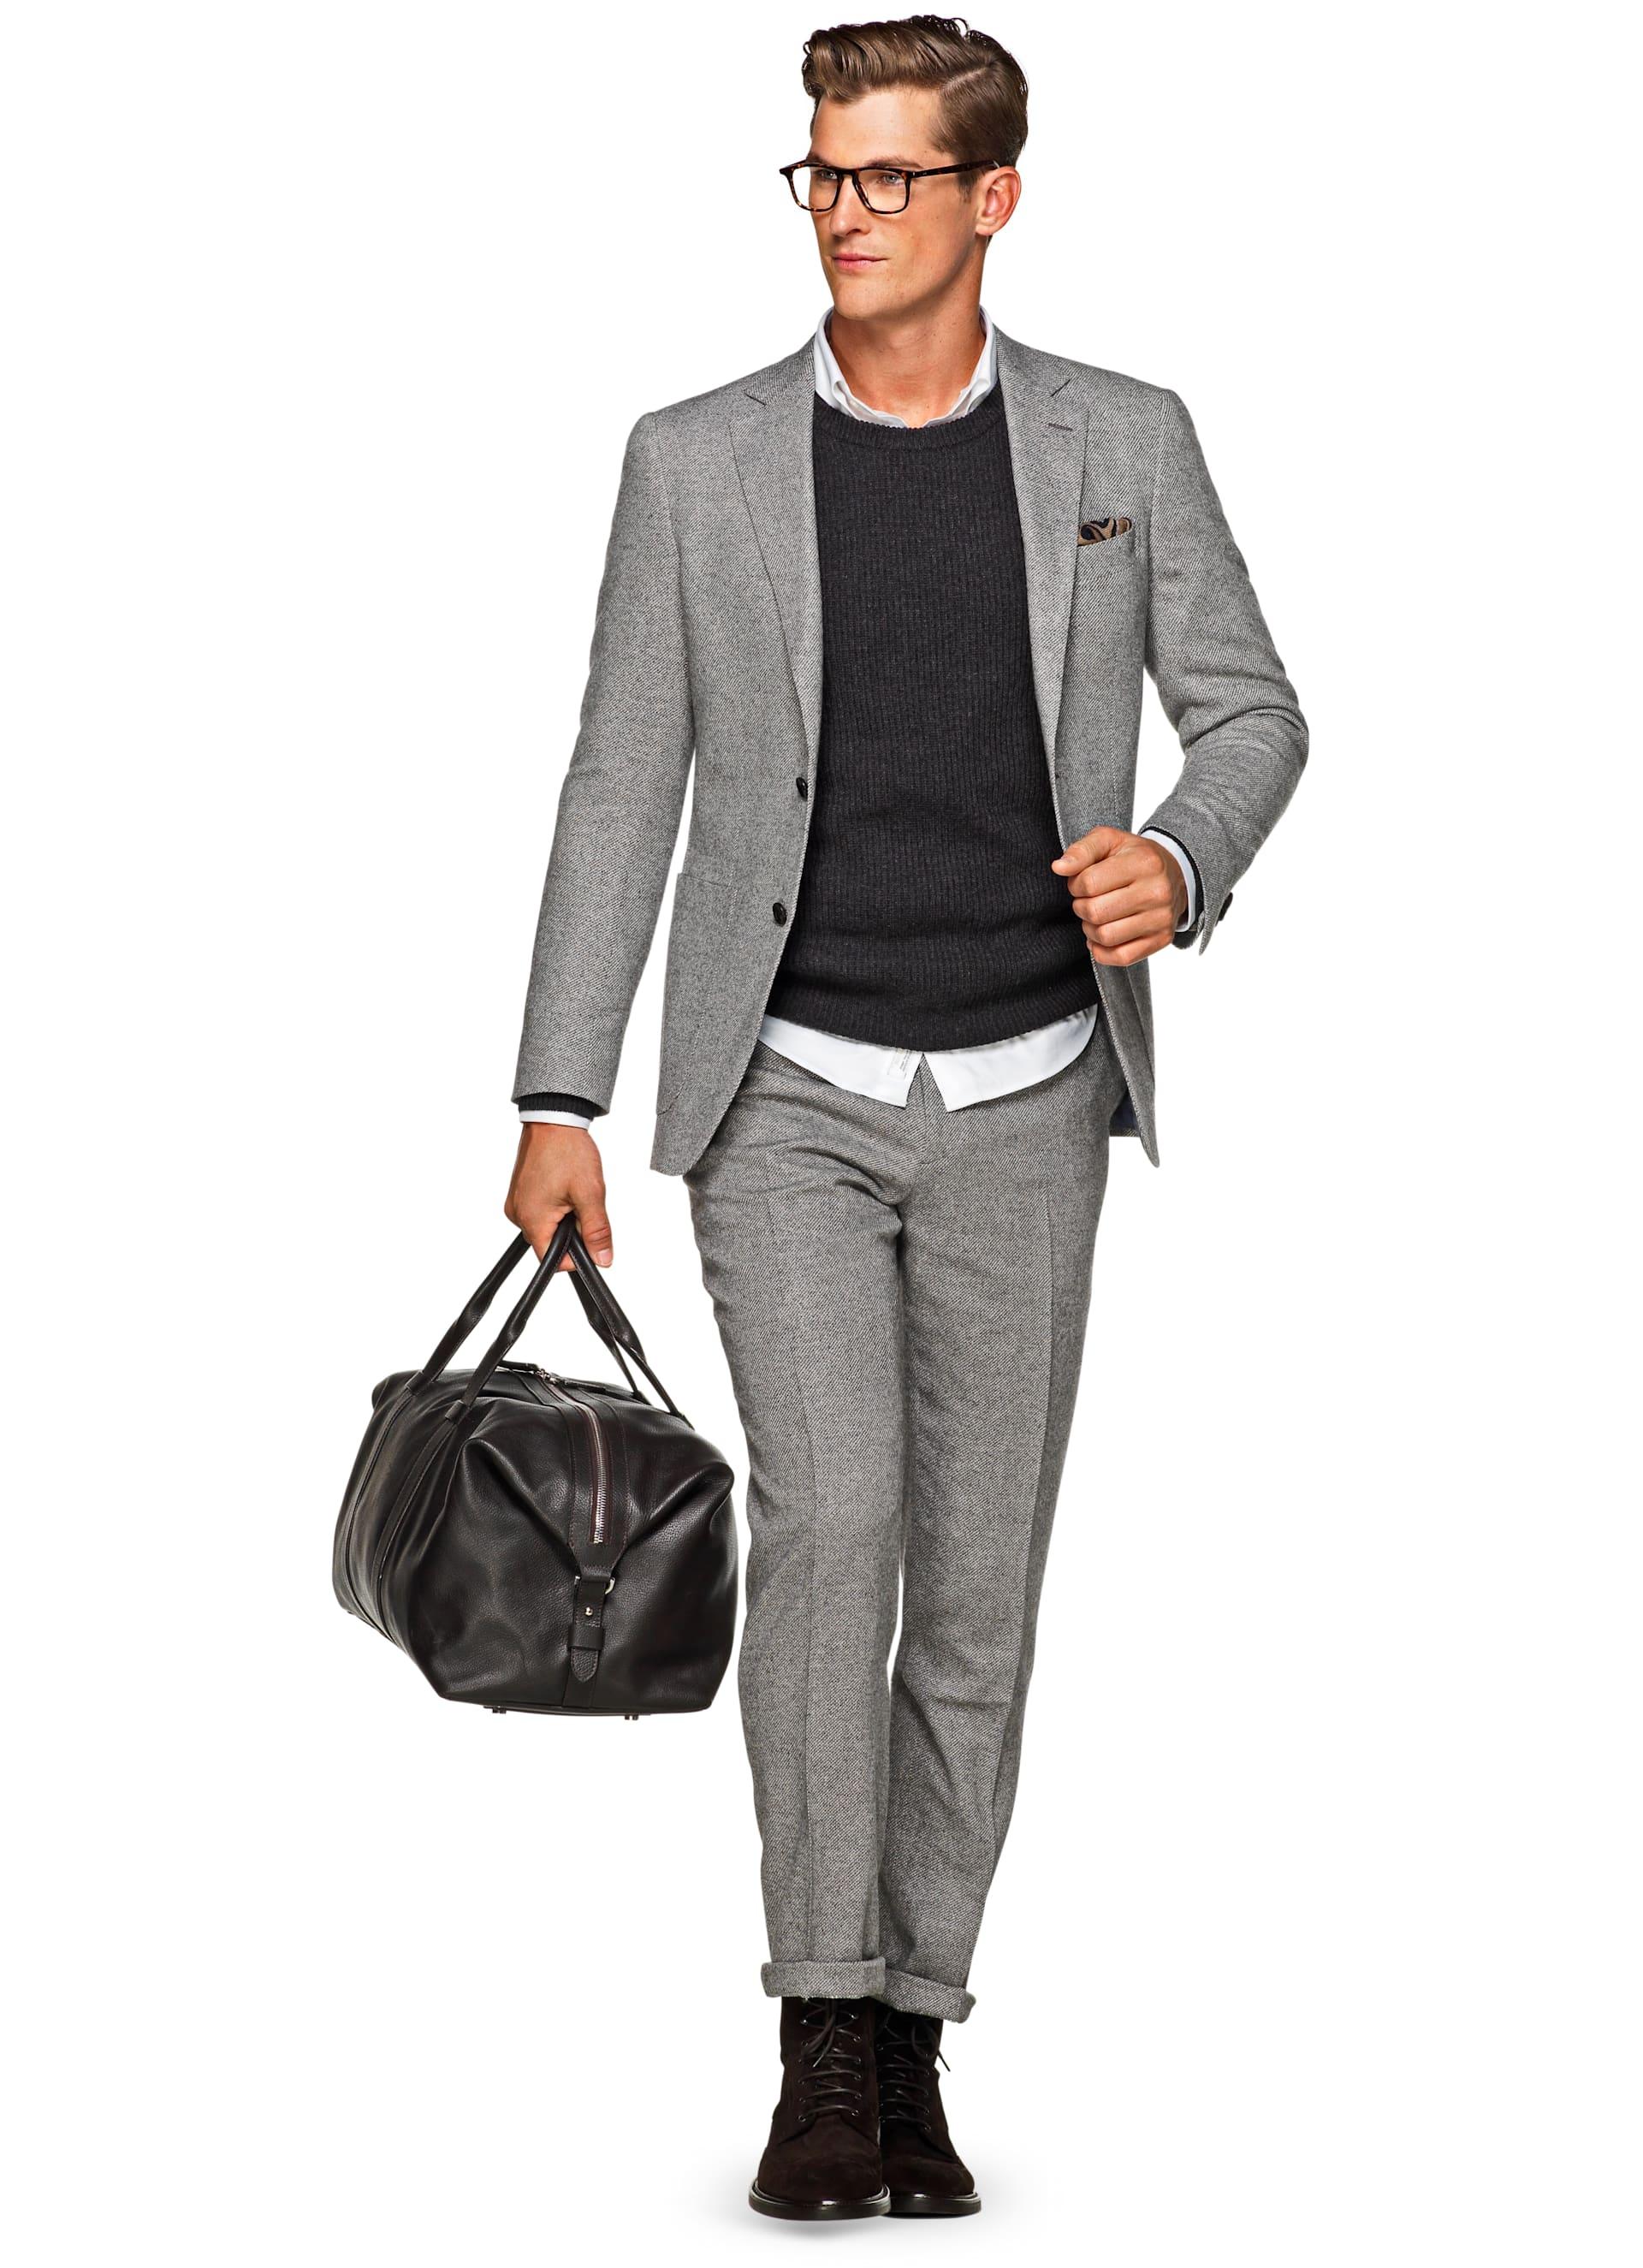 gallery in peak lyst light for lapel slim clothing klein normal men calvin product grey gray fit suit